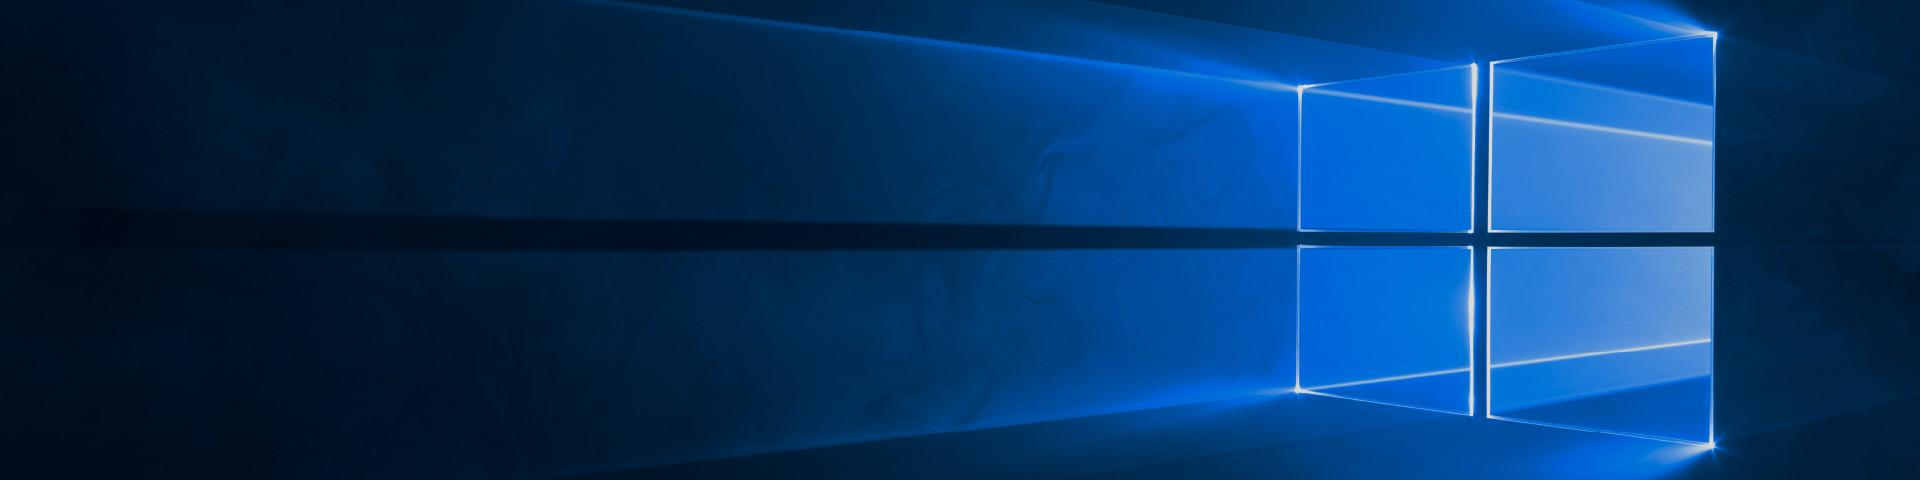 Windows 10 現己登場,您今天便可免費下載。*